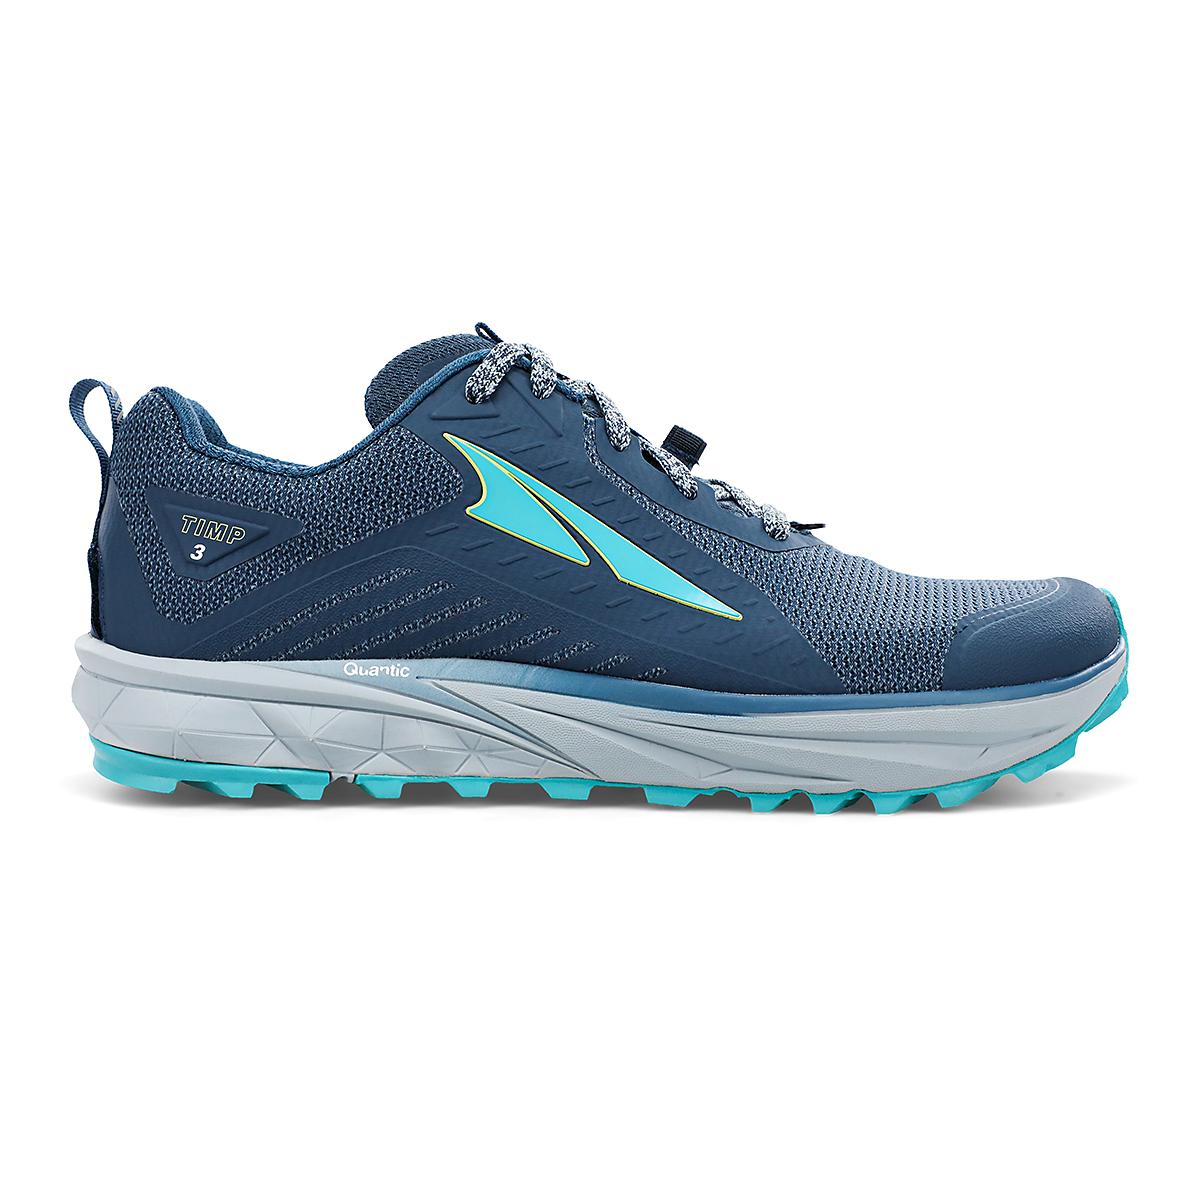 Women's Altra Timp 3 Trail Running Shoe - Color: Dark Blue - Size: 6 - Width: Regular, Dark Blue, large, image 1